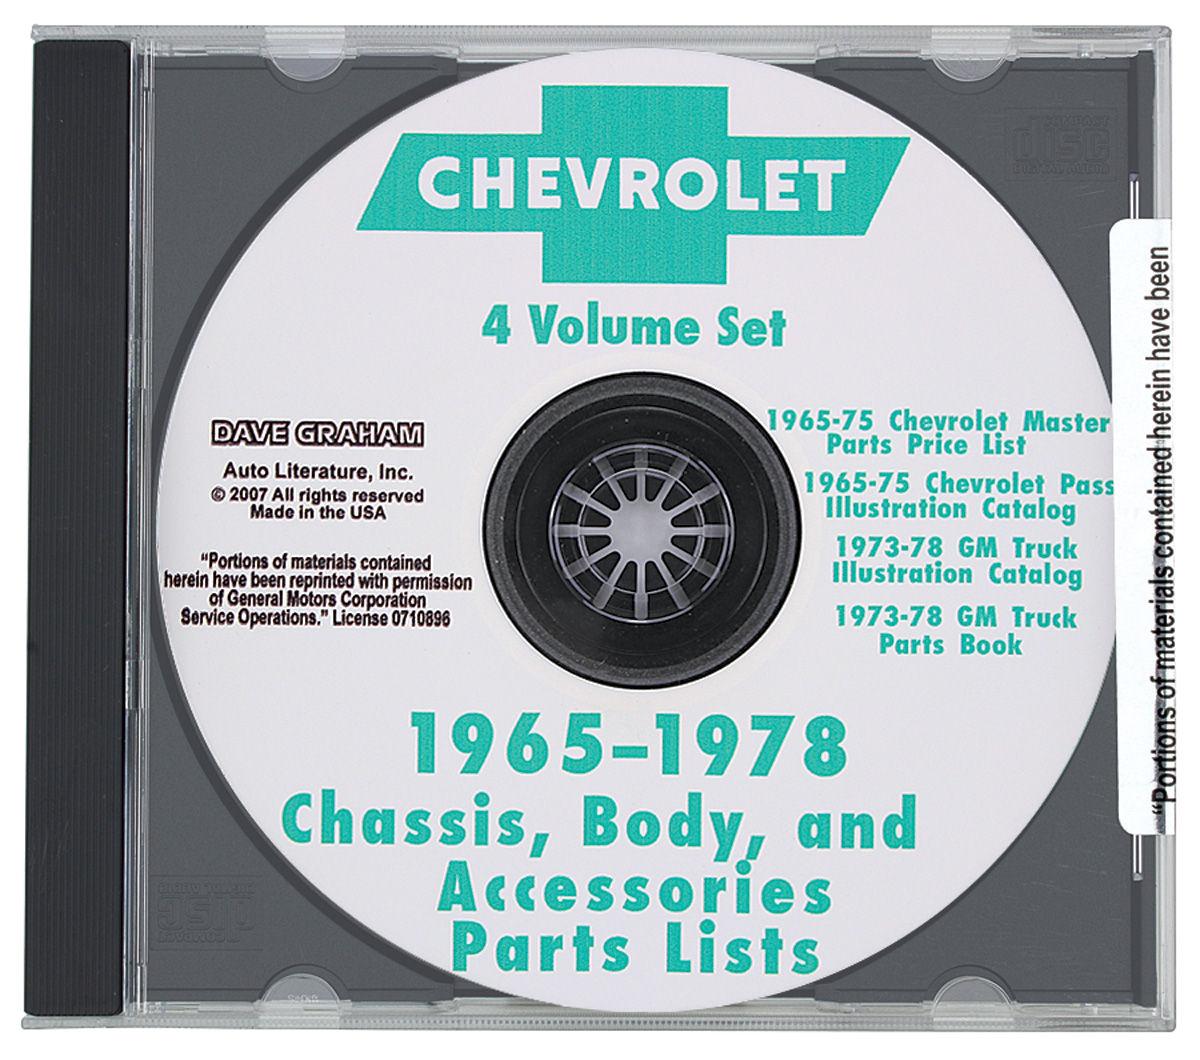 Photo of Chevrolet Parts Catalog CD 1965-78